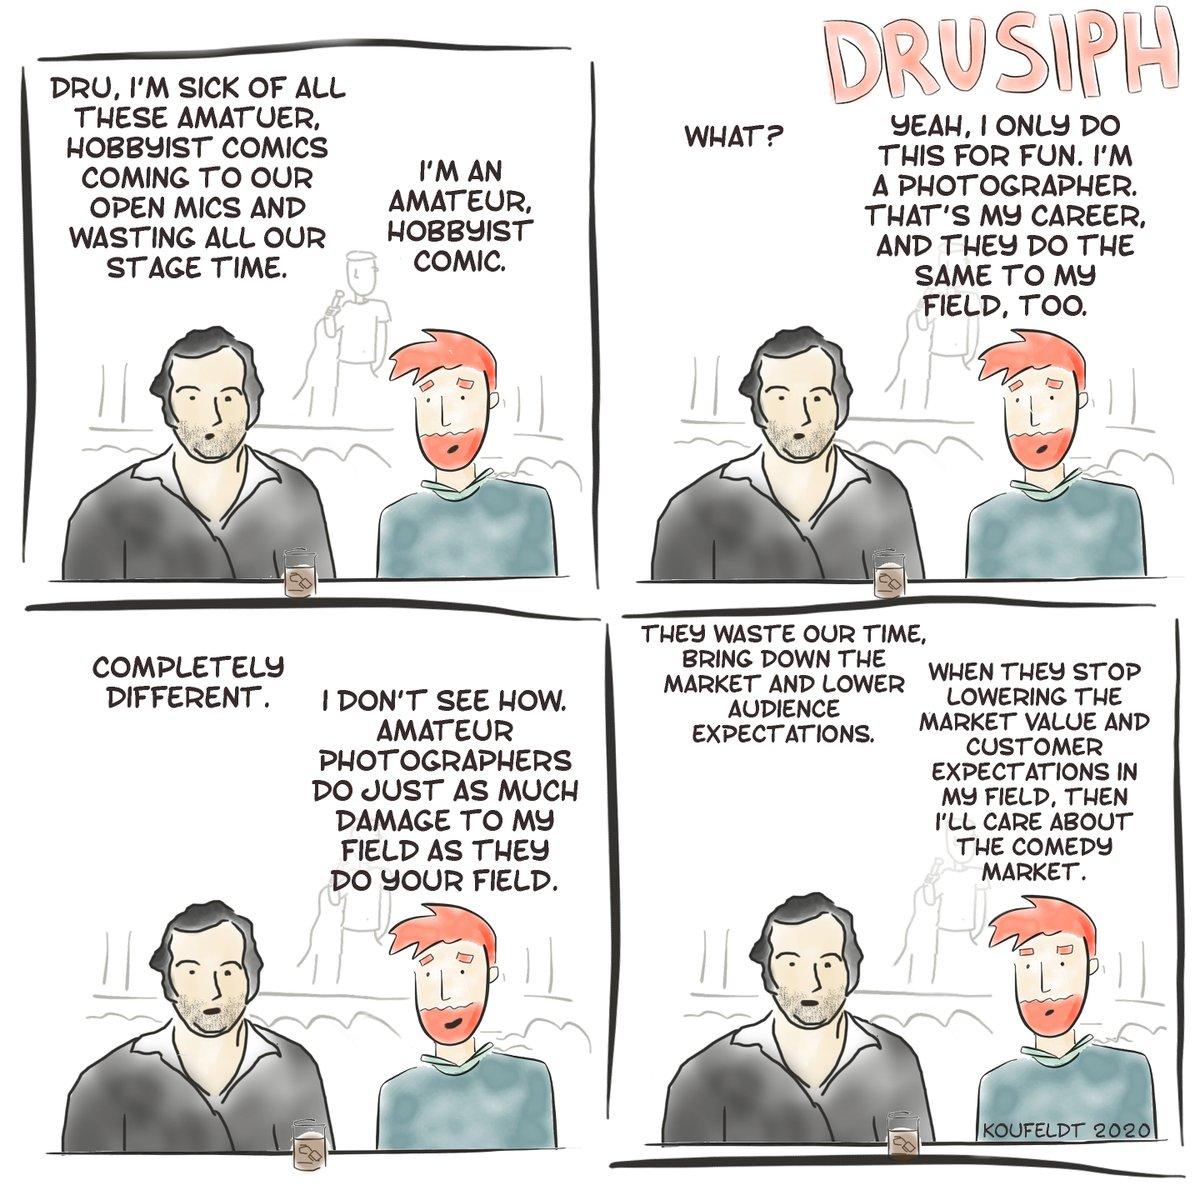 #drusiph #comic #comicstrip #comicbook #comedy #cartoon #webtoon #webcomic #webseries #writing #satire #sarcasm #joke #laughter #humour #funny #comedian #standupcomedy #conversation #dialogue #photography #amateur #hobby #hobbyist #marketvalue #payscale #openmics #stagetime #jobpic.twitter.com/z8tx5jNfNL